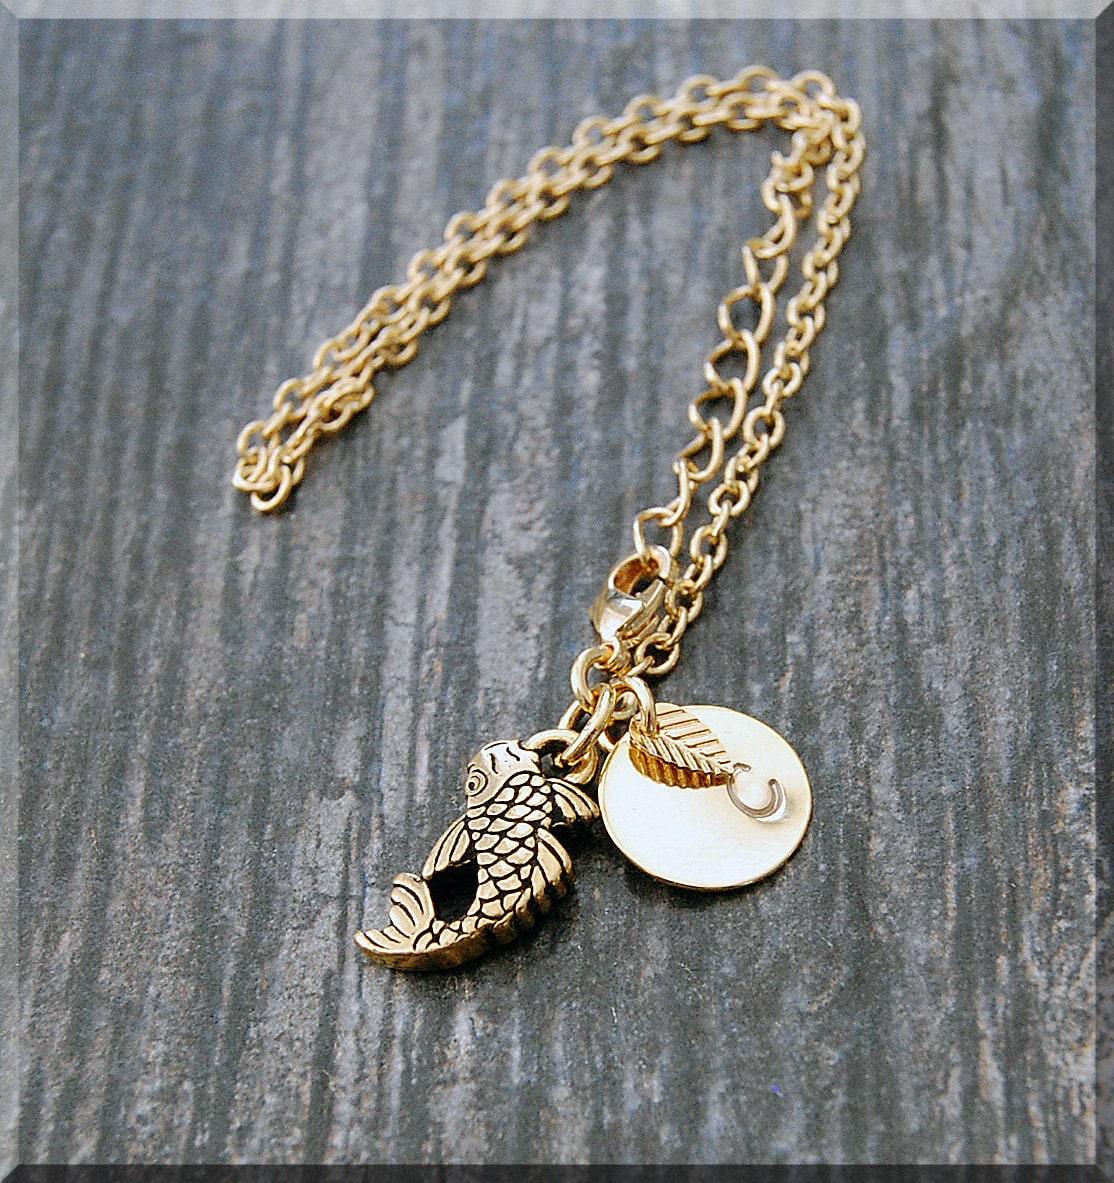 Initial Charm Bracelets: Gold Koi Fish Bracelet Initial Charm Bracelet Personalized